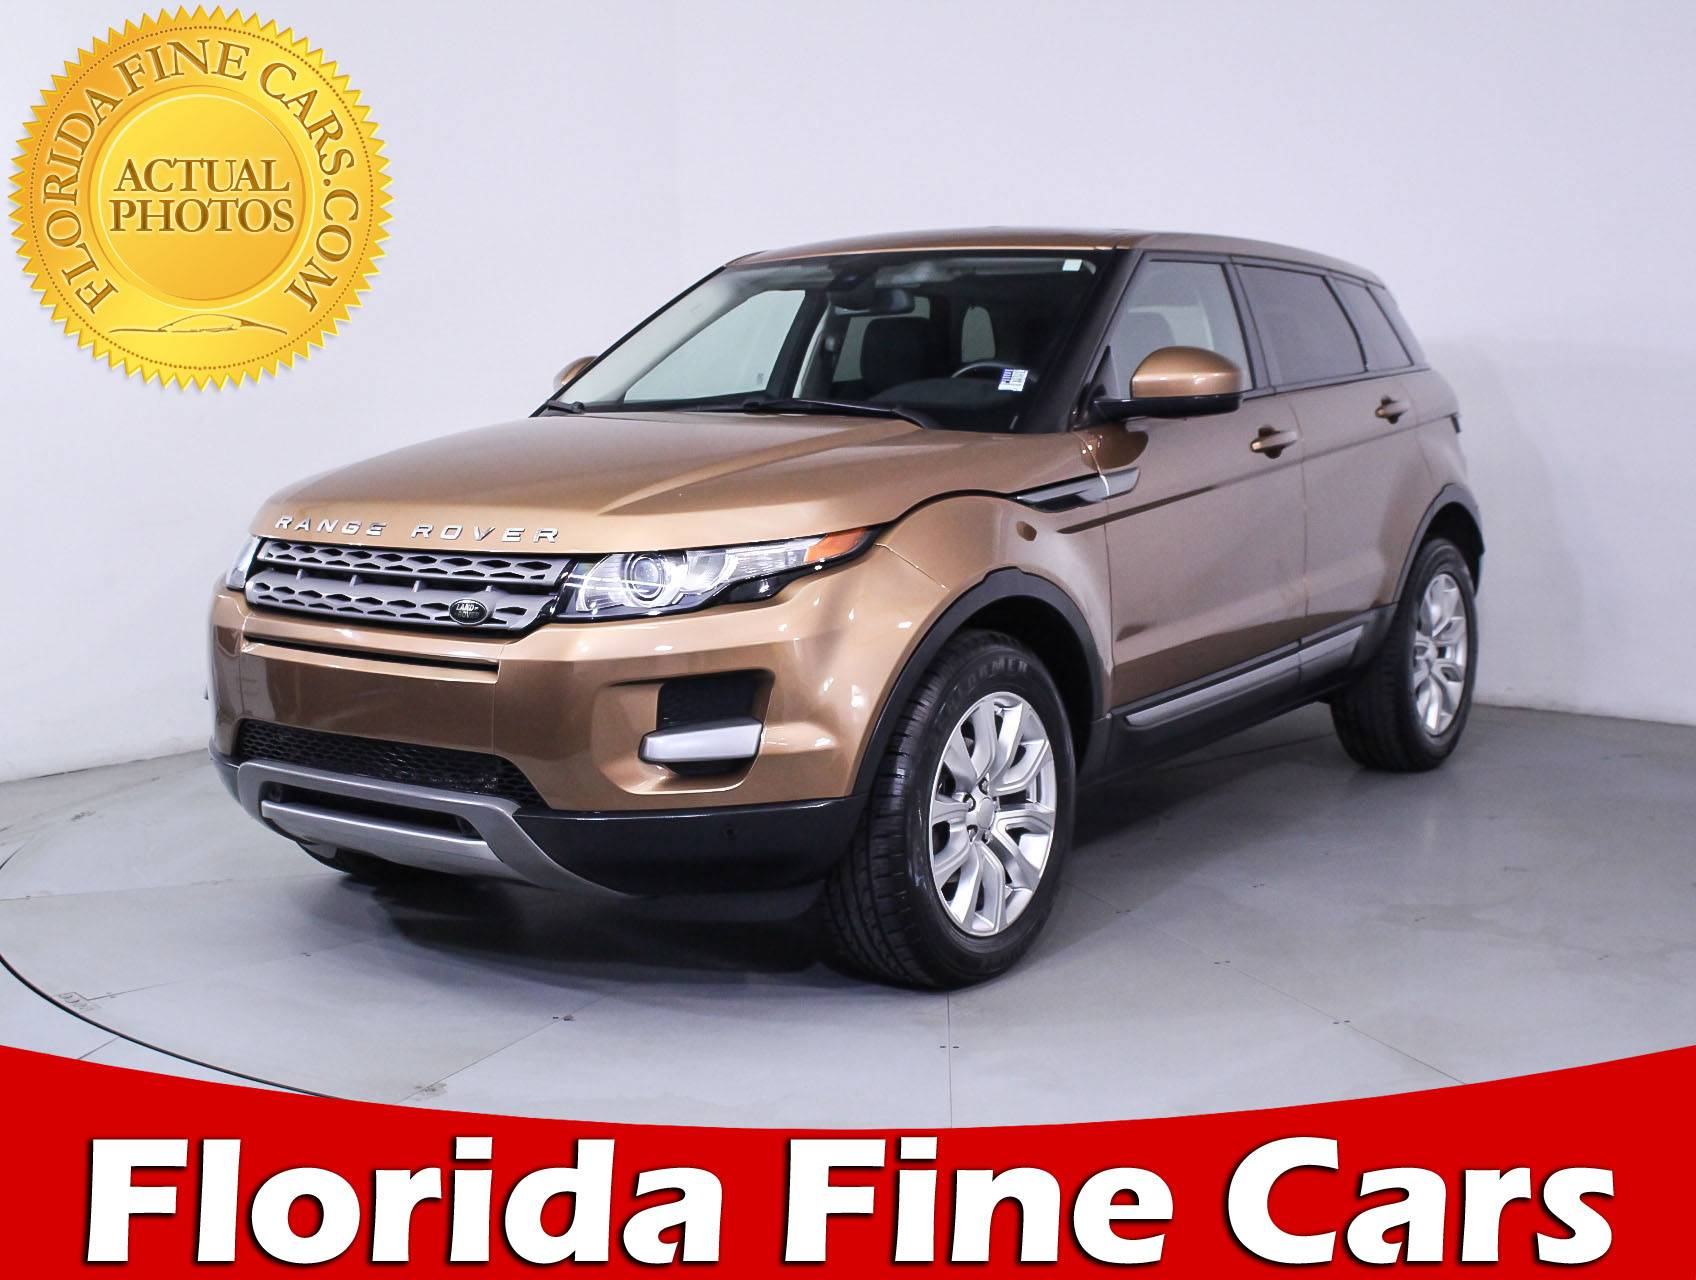 Land Rover Dealership Michigan >> Land Rover Dealership Michigan | News of New Car Release